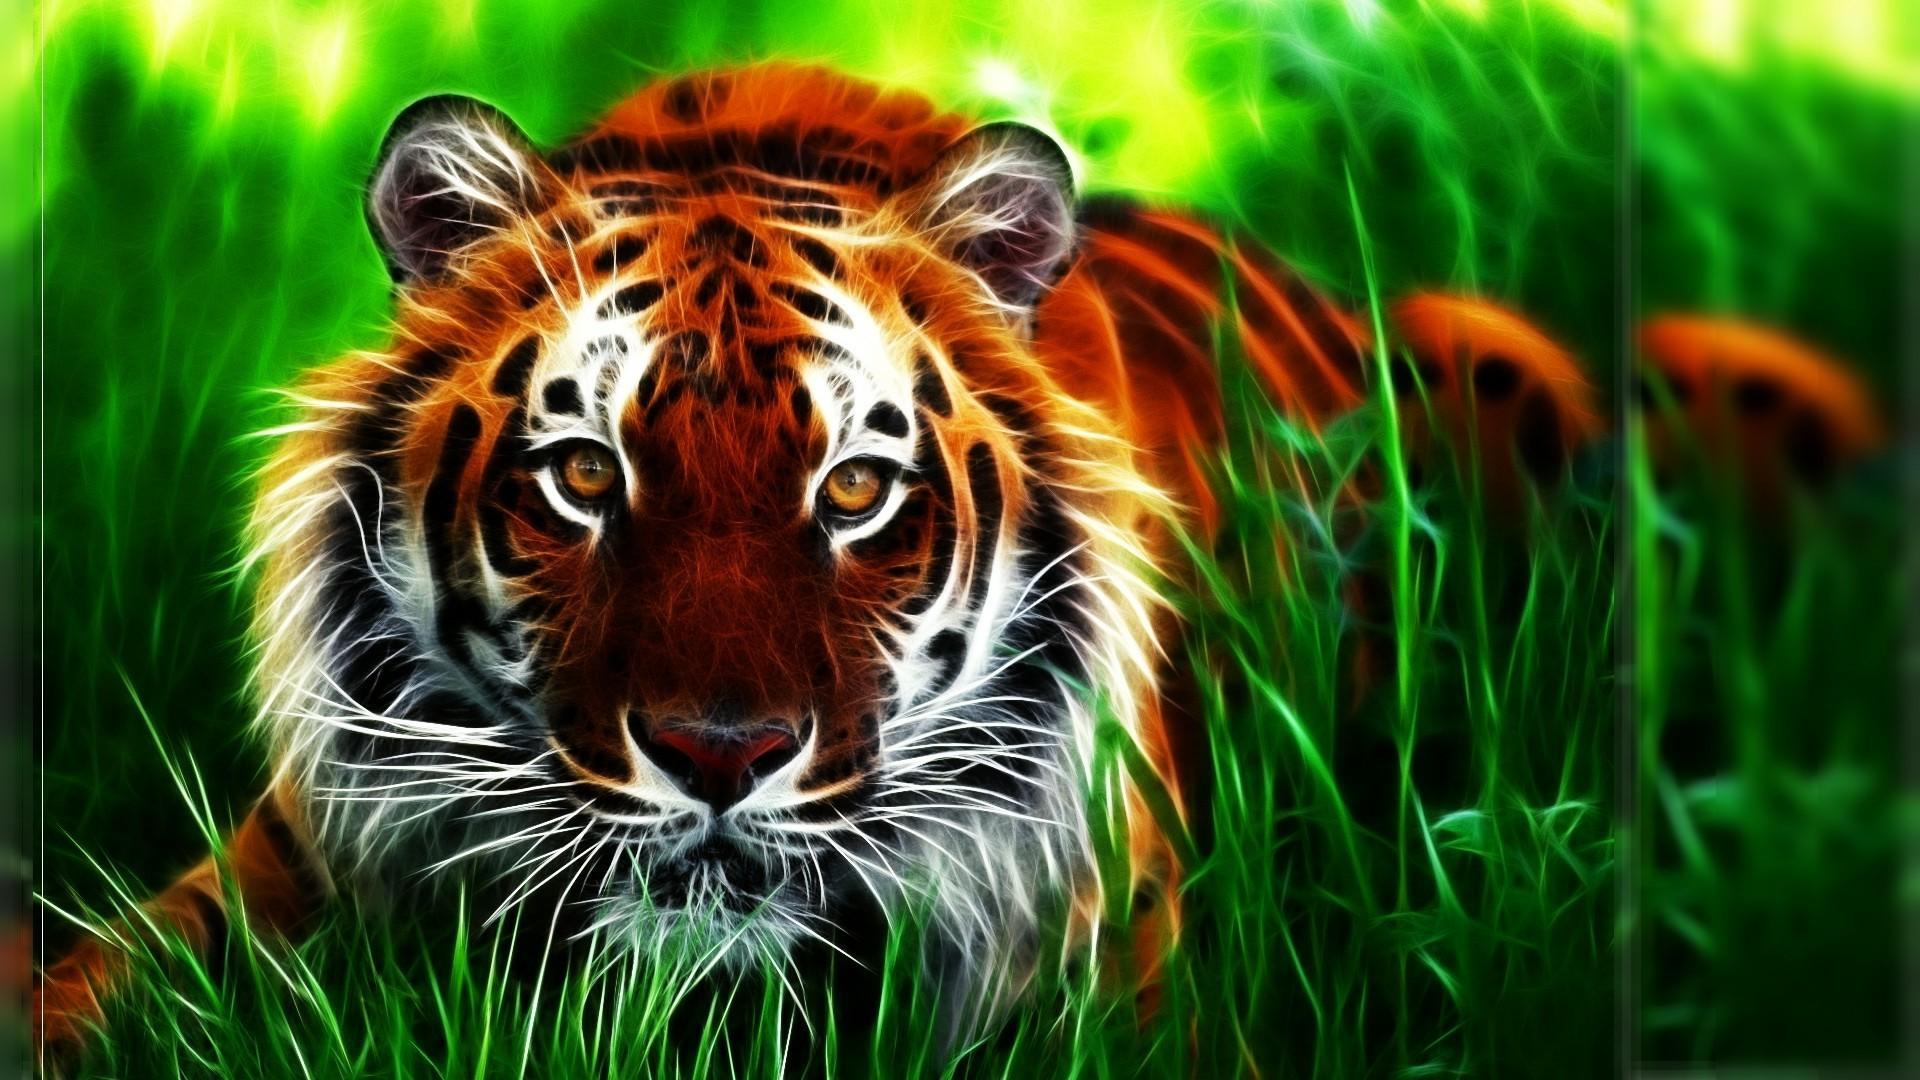 Clemson Tigers Iphone Wallpaper Clemson Wallpapers 66 Images